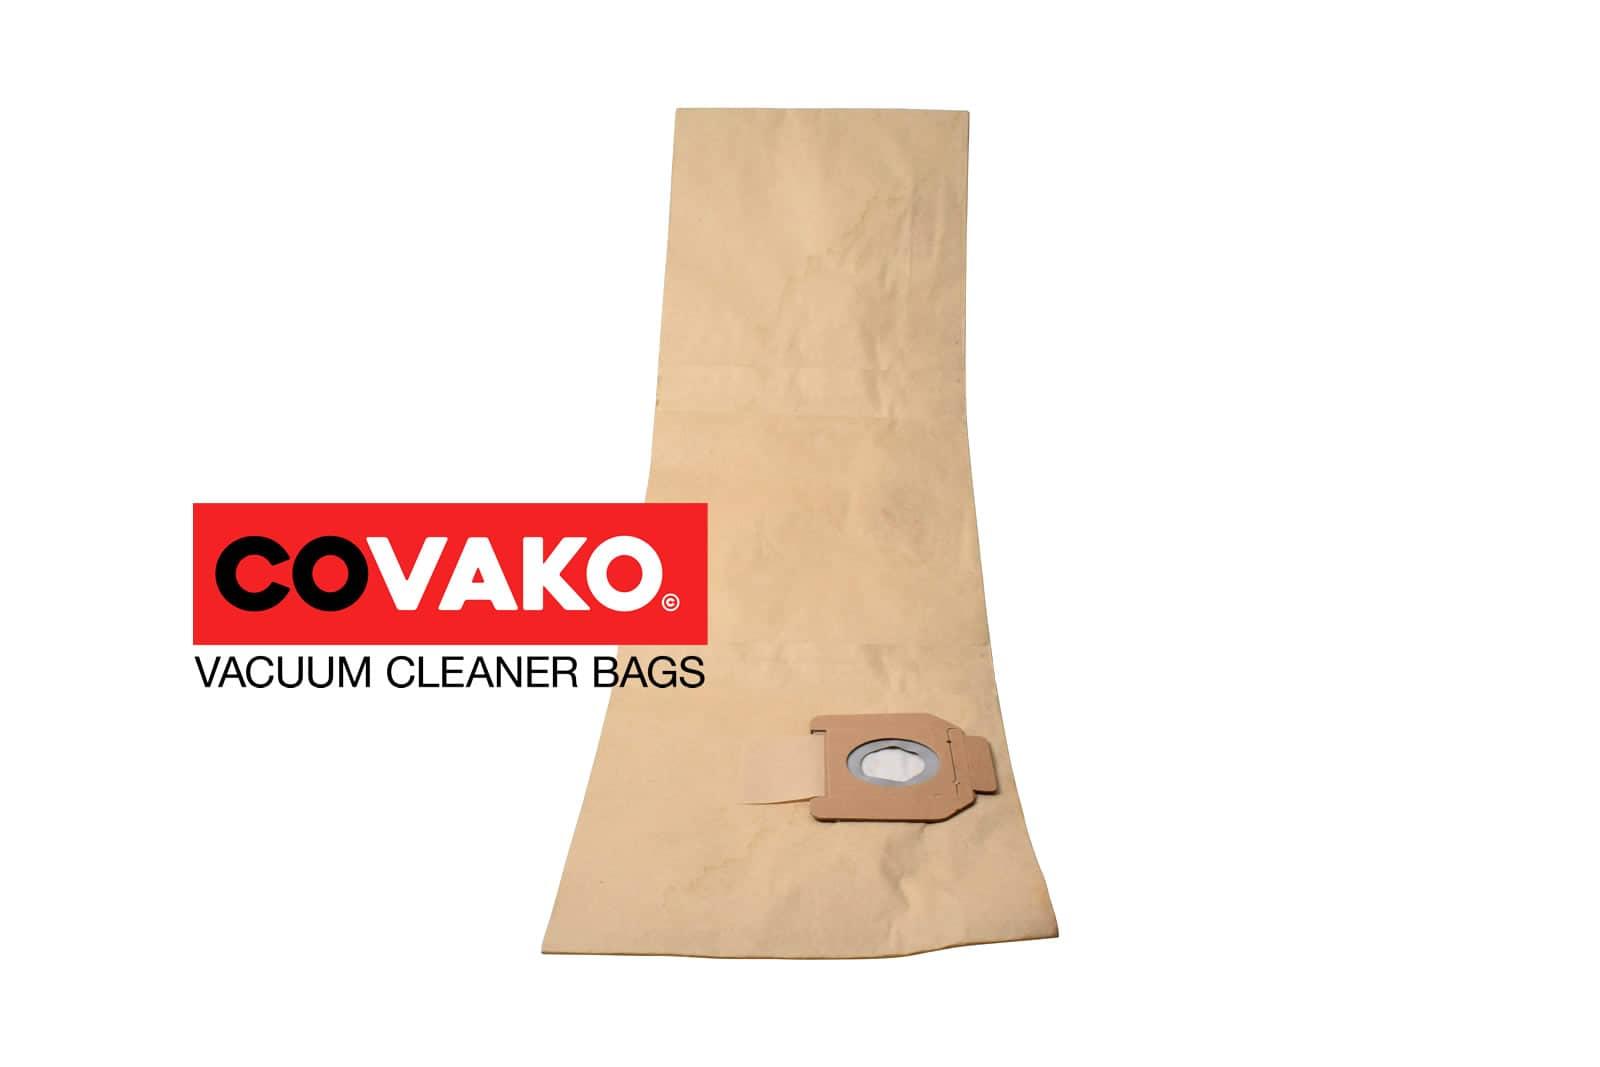 Wap SQ 5 / Papier - Wap sacs d'aspirateur